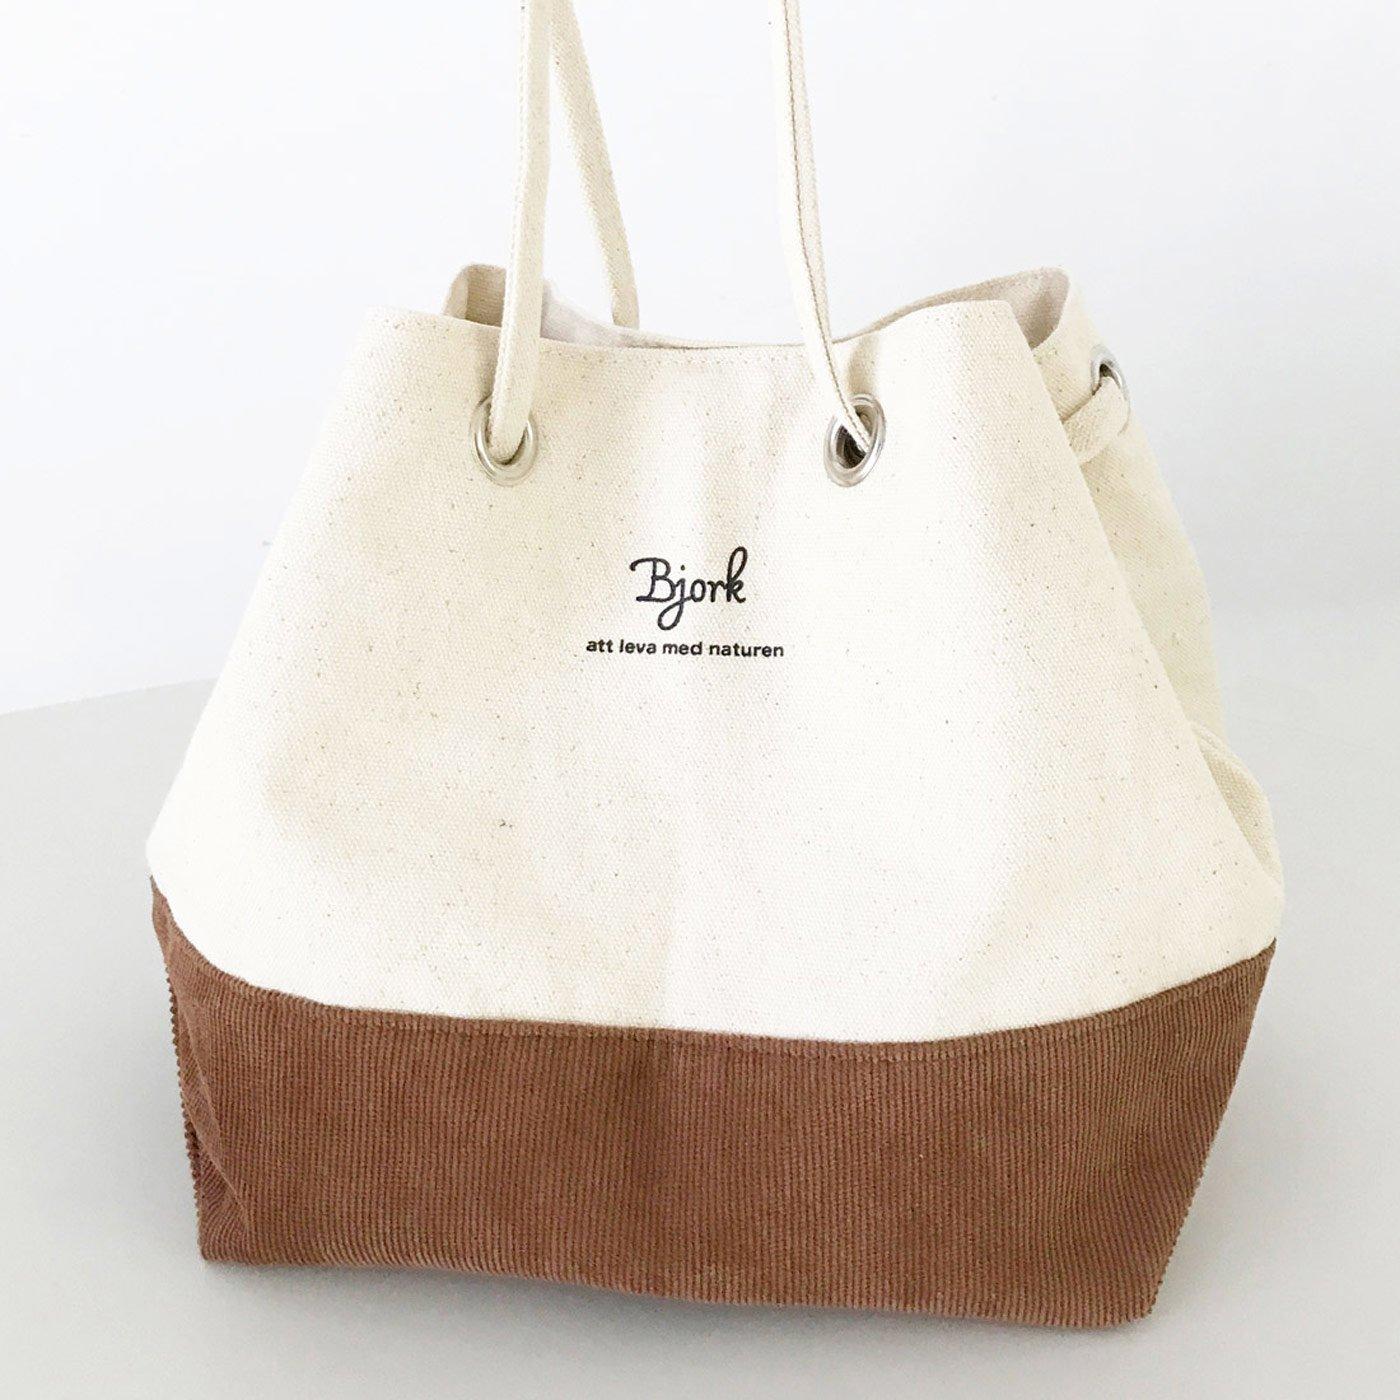 IEDIT[イディット] SELECT 帆布×コーデュロイの巾着バッグ